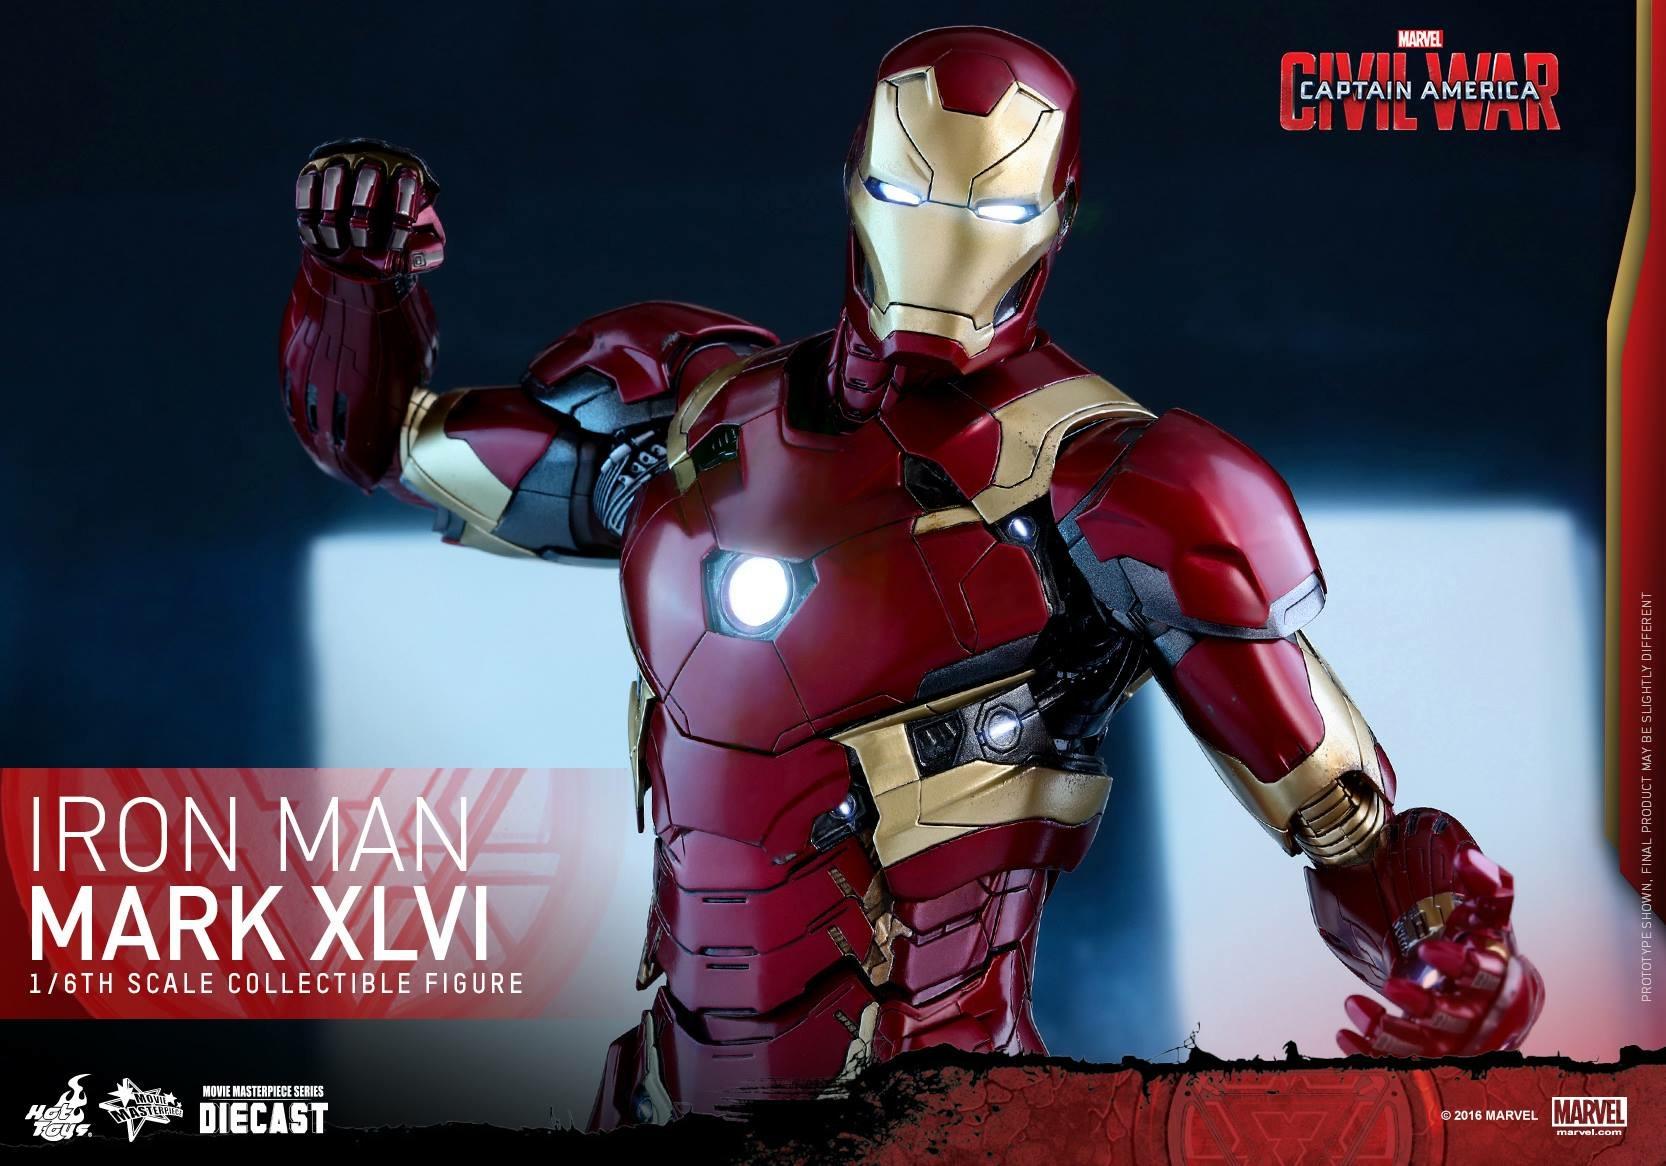 CAPTAIN AMERICA : CIVIL WAR - IRON MAN MARK XLVI (MMS353DC16) 160419024057521045